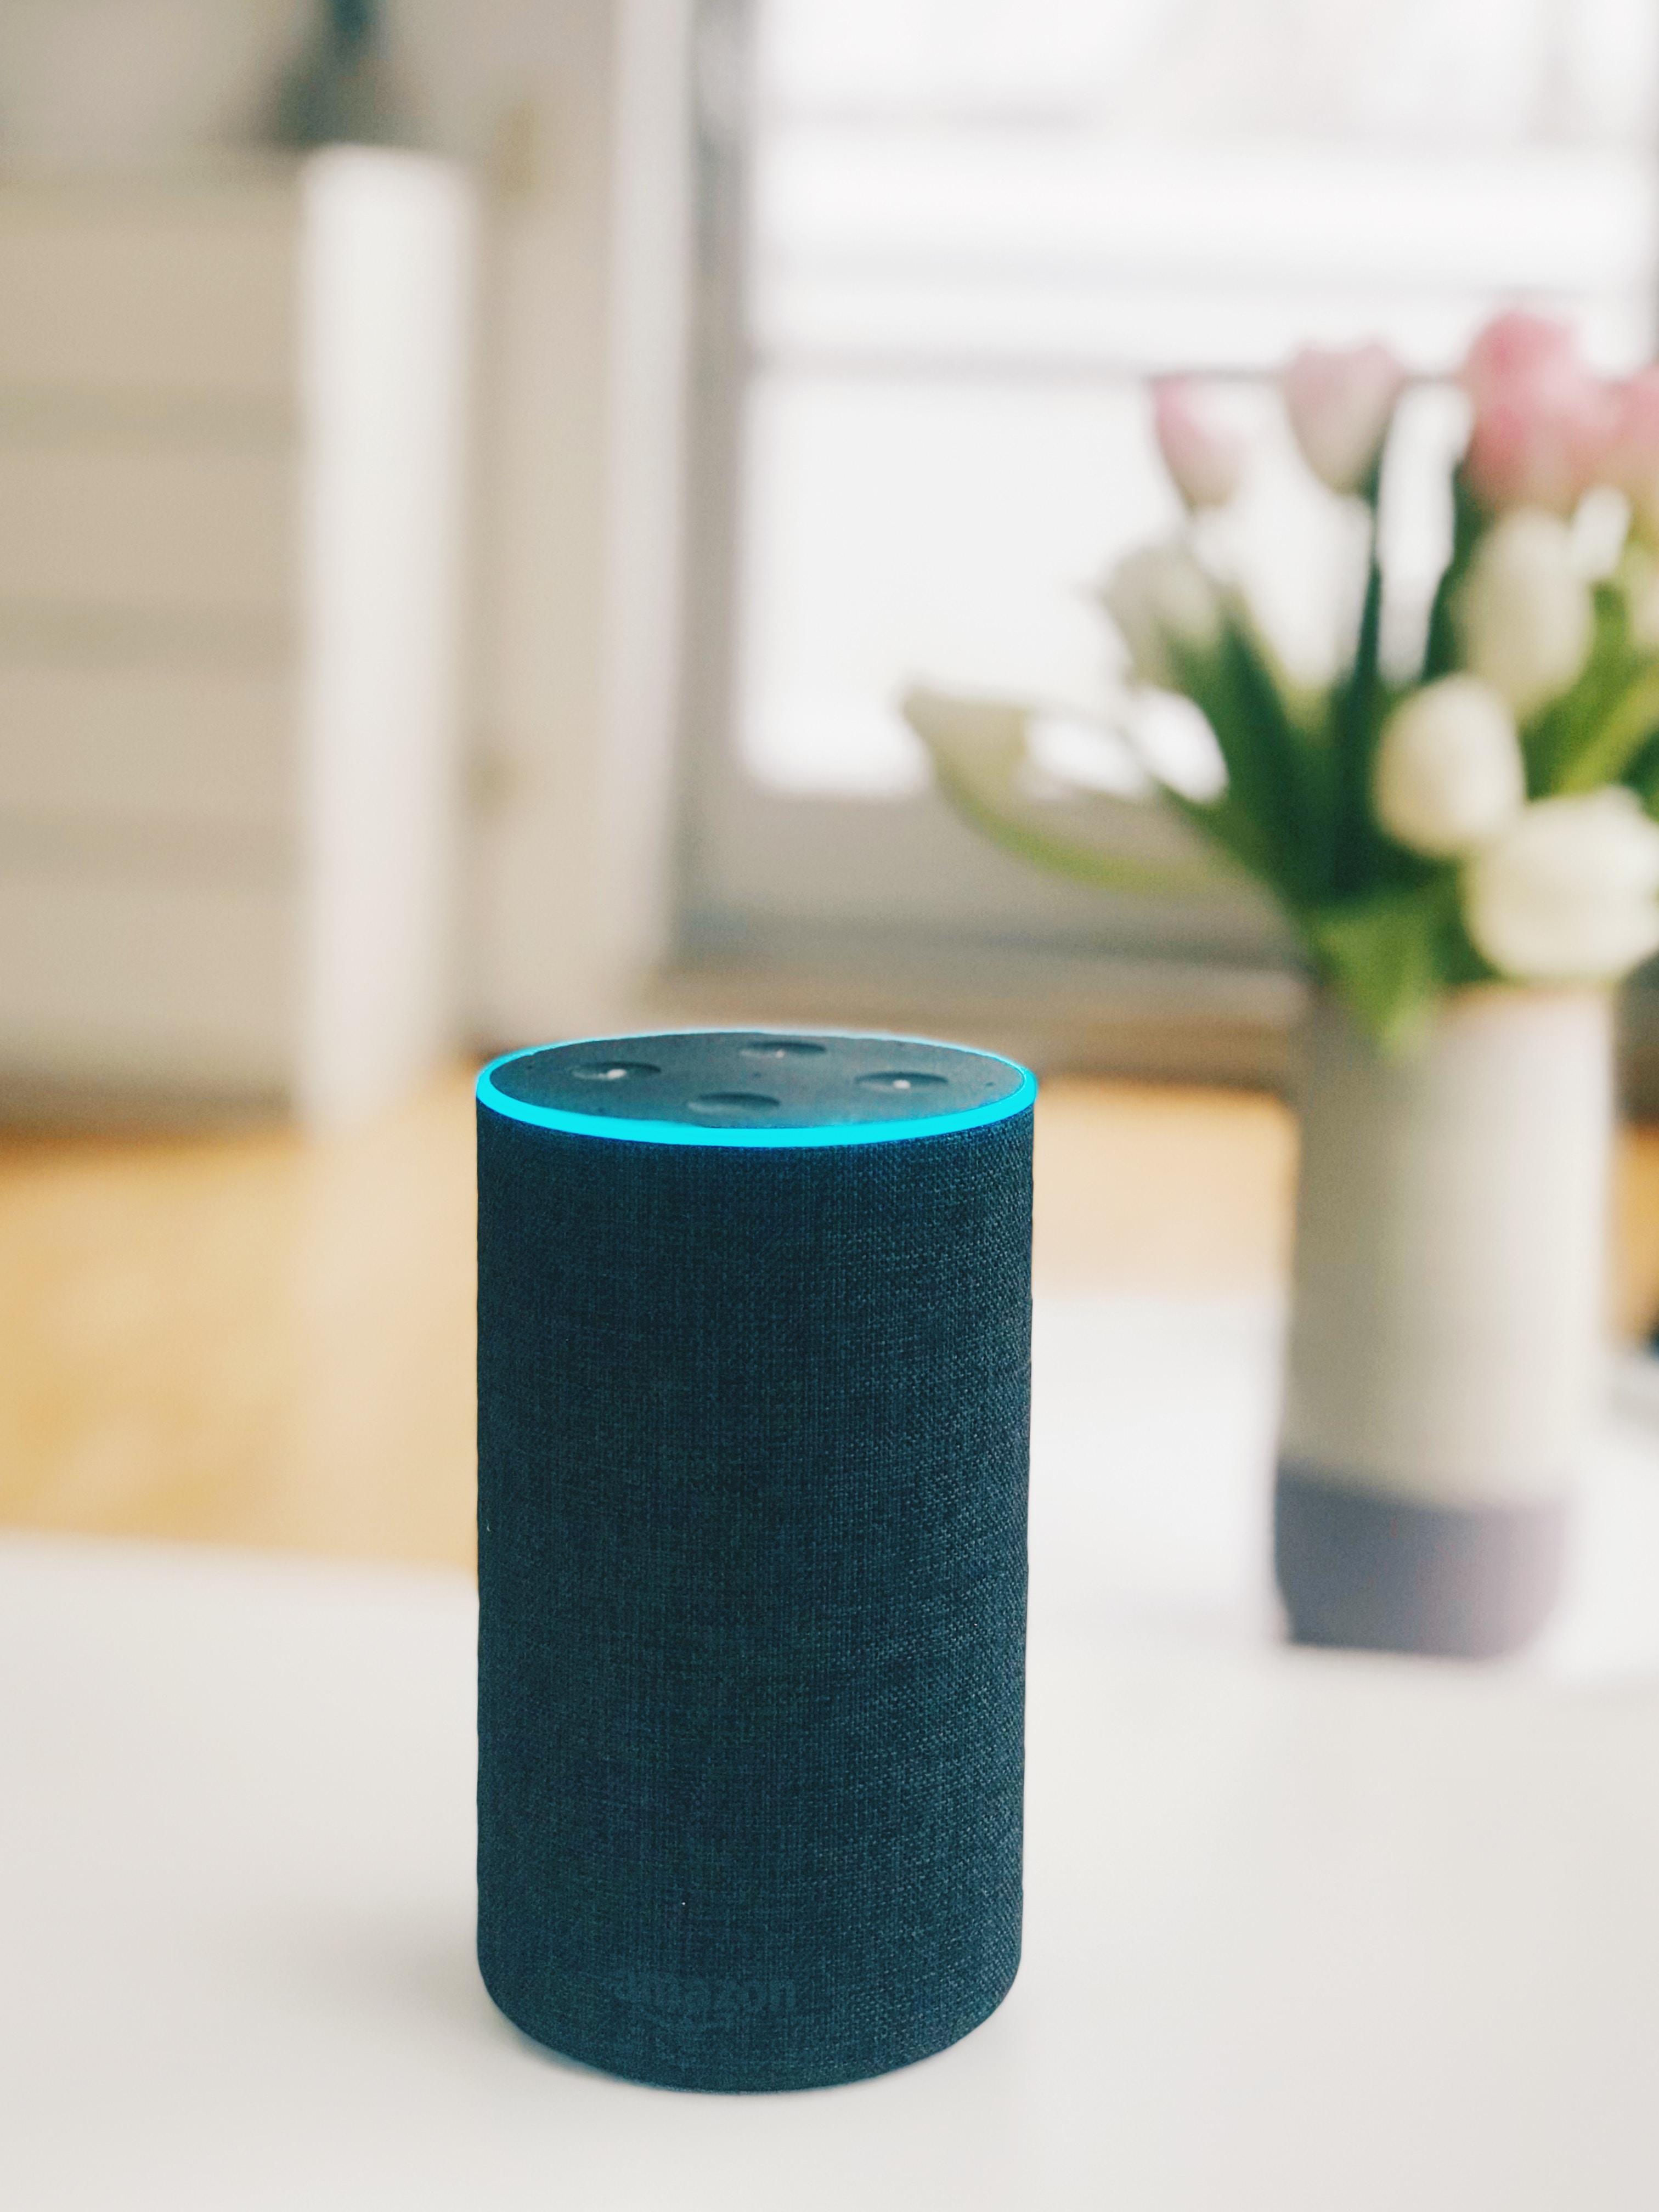 black and teal portable speaker